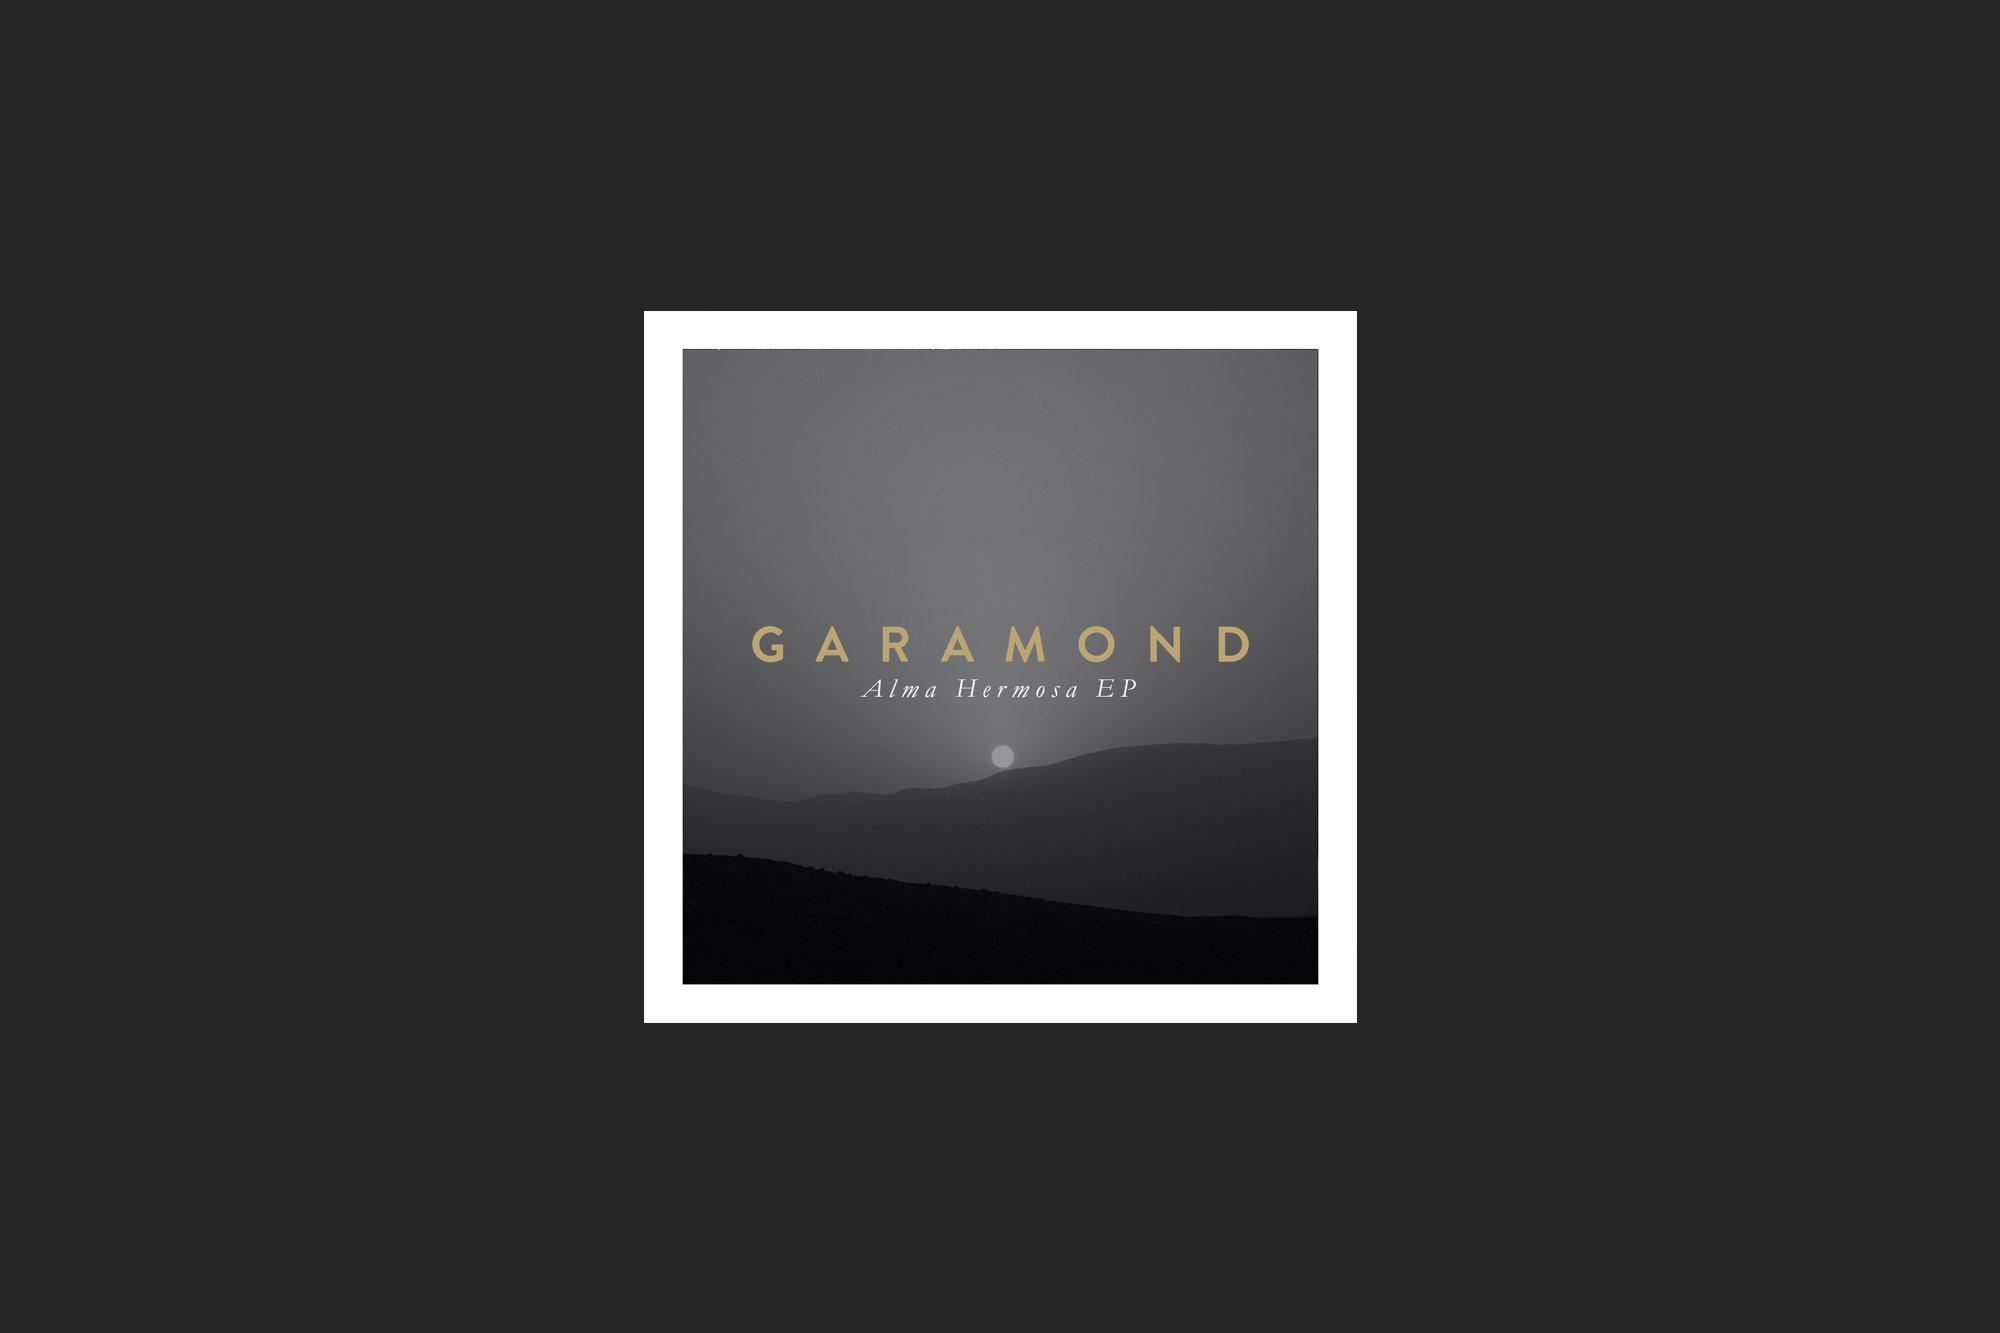 gpj-design-garamond-music-cs-02